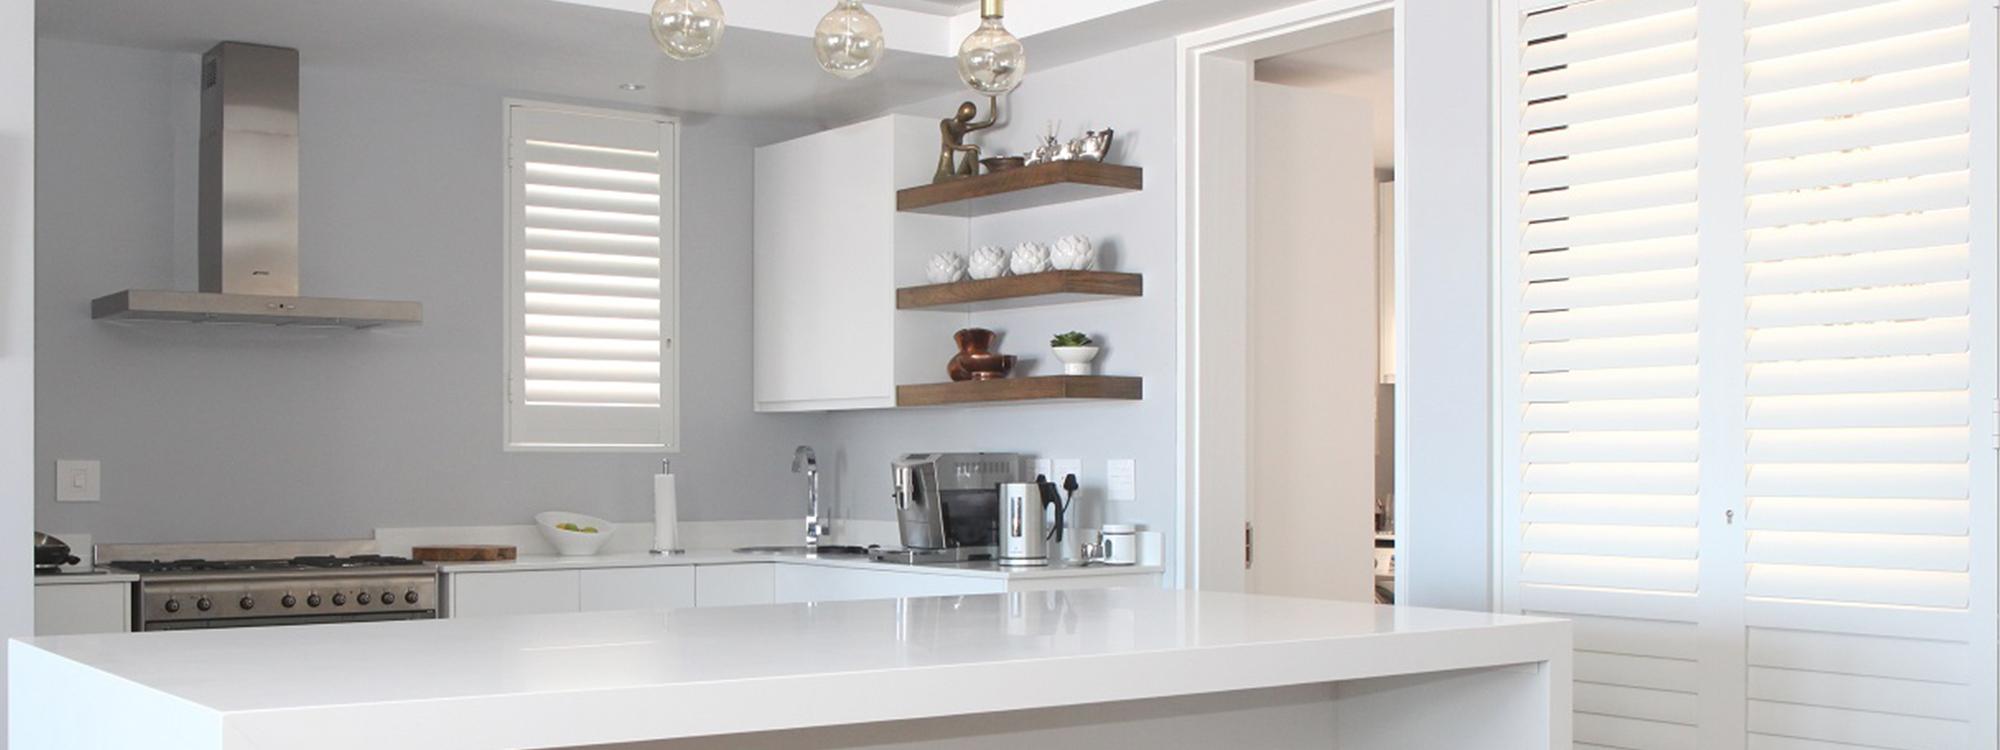 Security-shutters-kitchen-silk-white